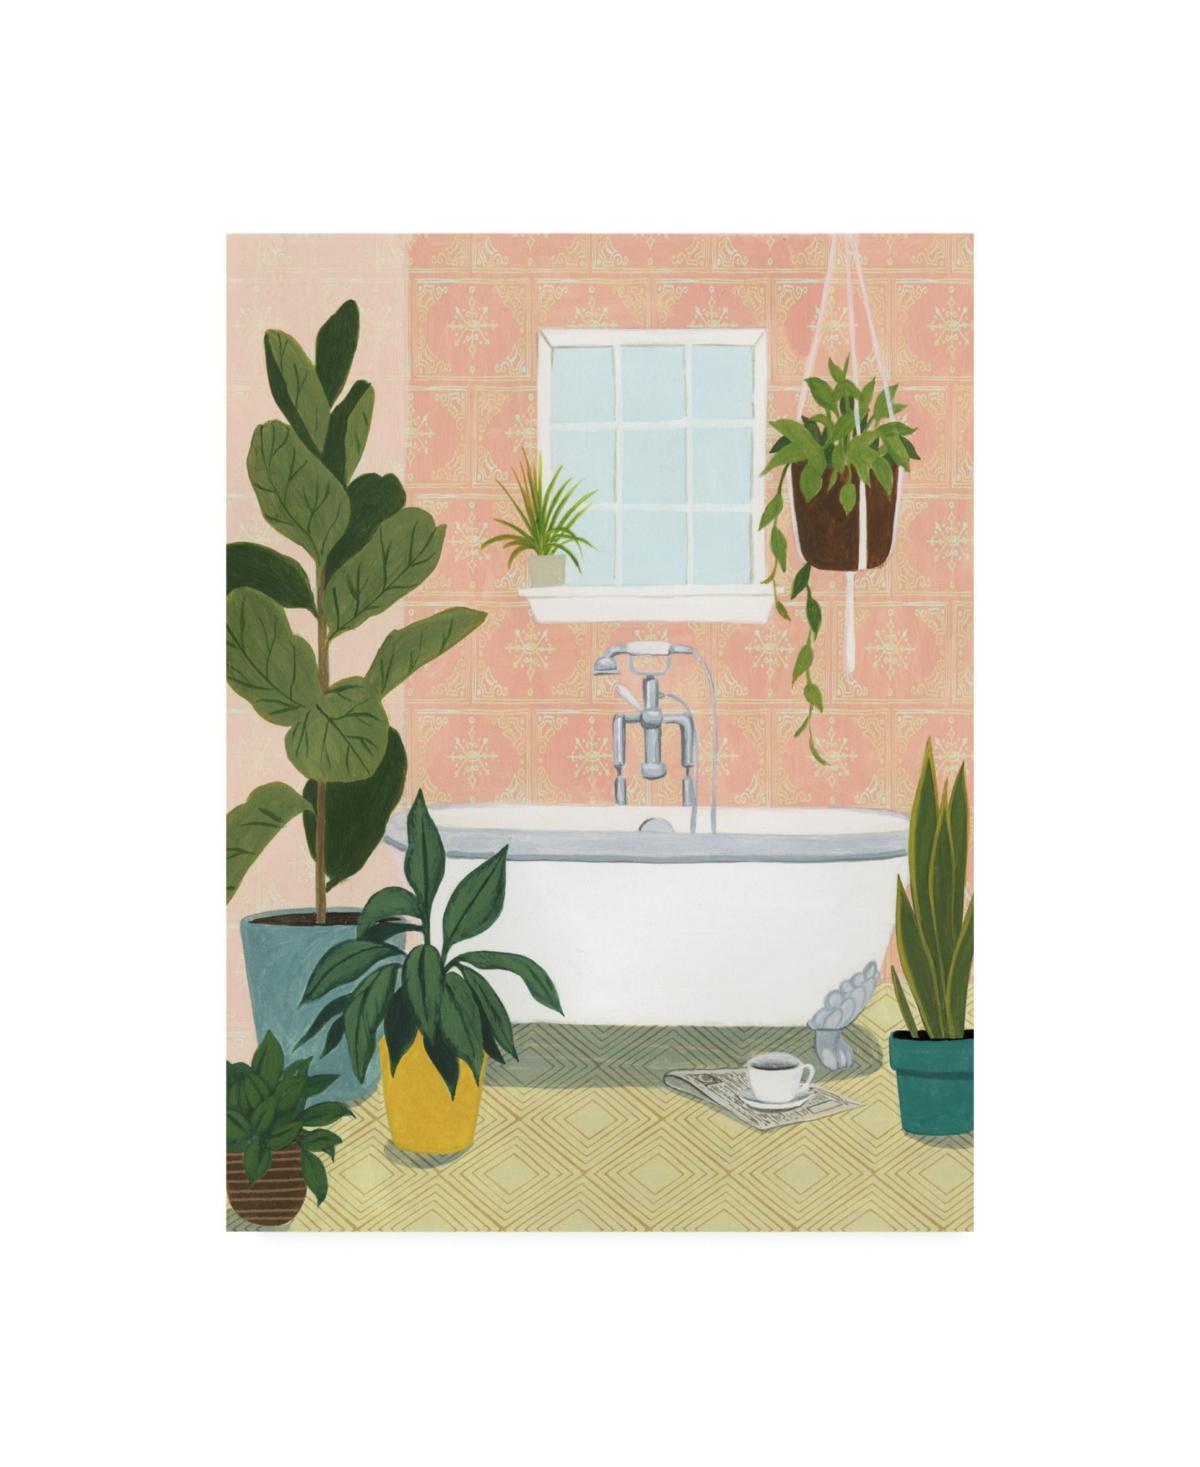 Grace Popp Bathtub Oasis Ii Canvas Art - 27